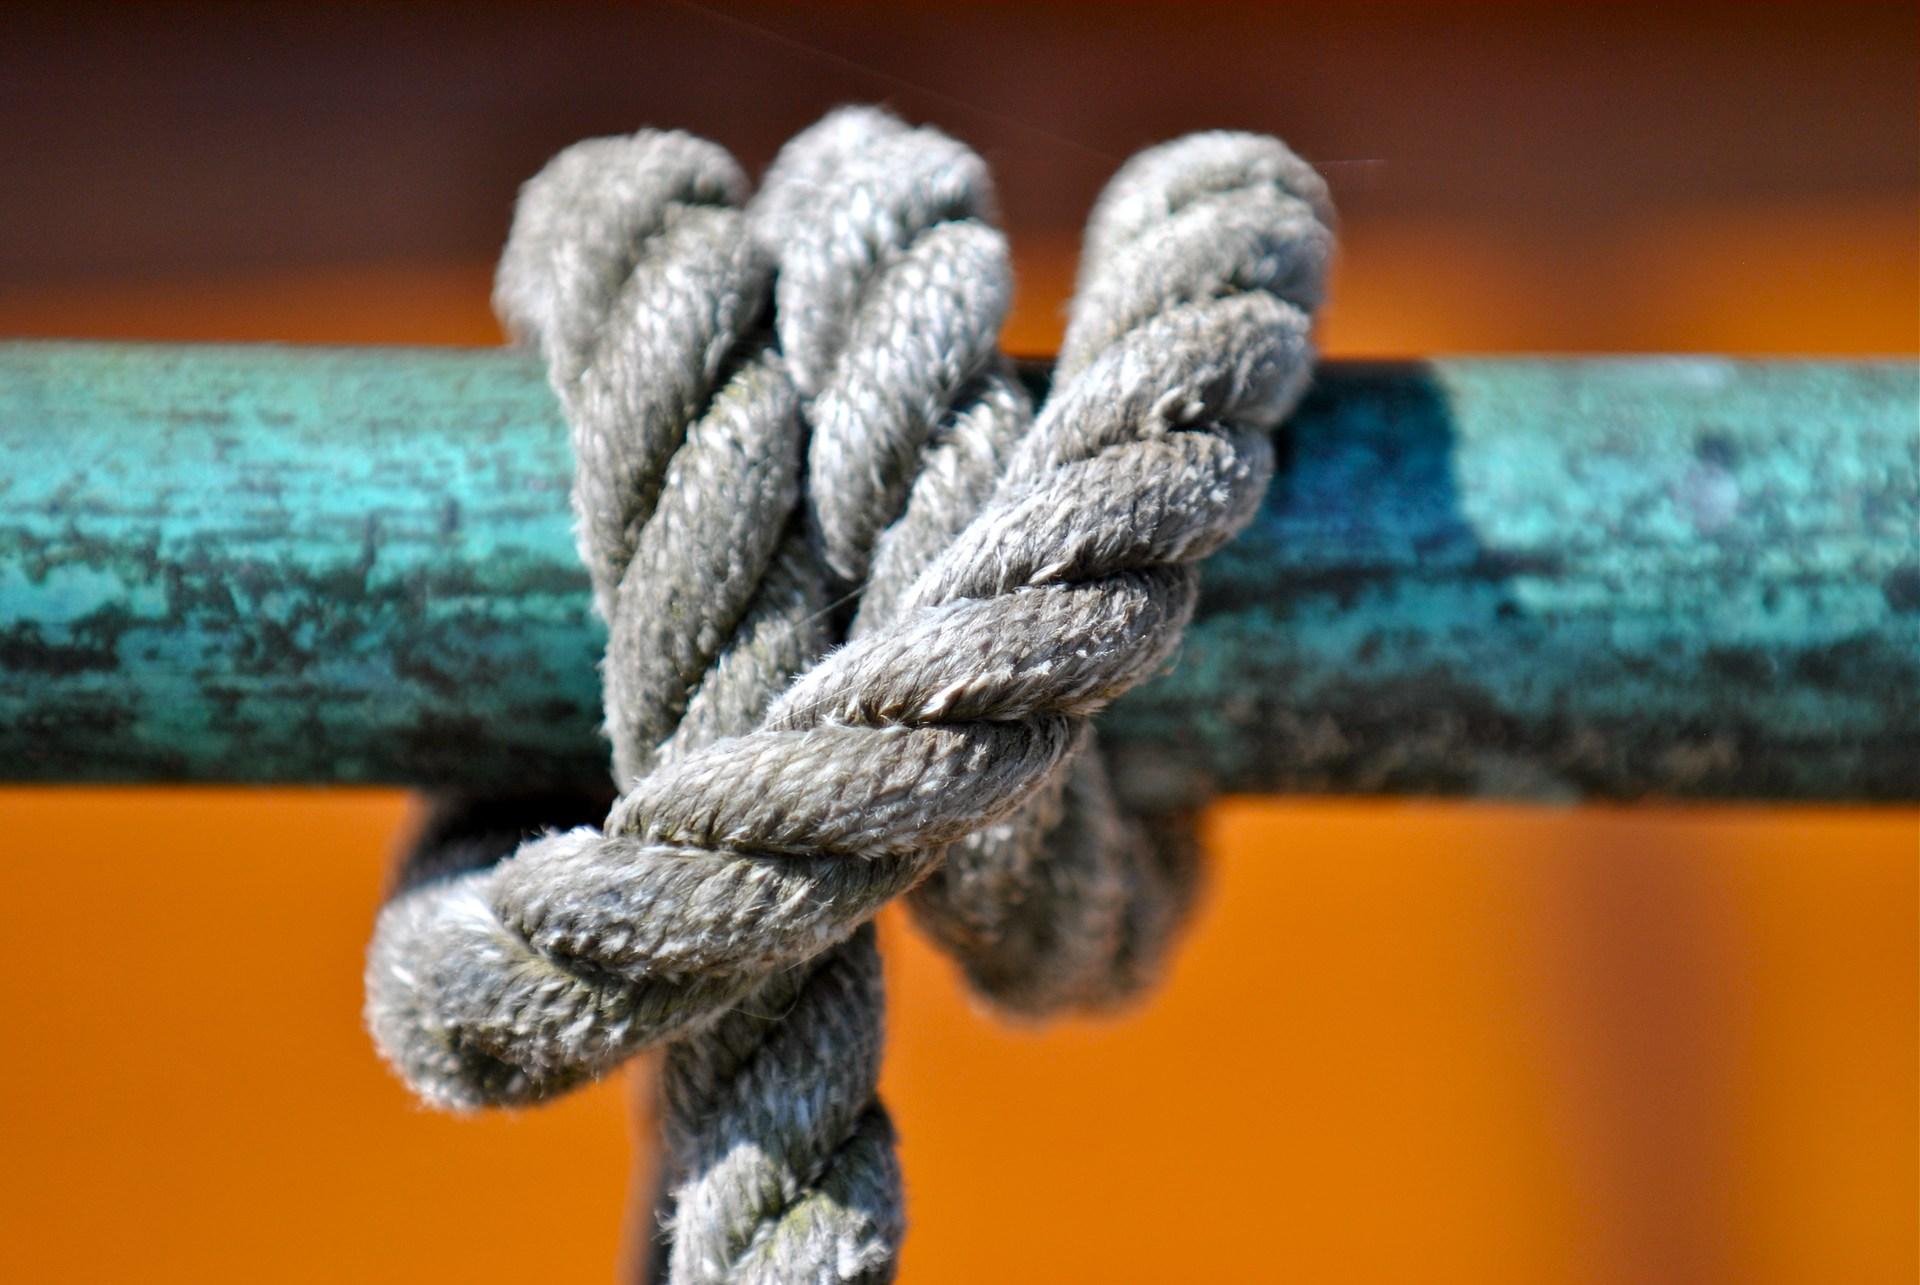 Rope on copper railing, Poulsbo, WA.